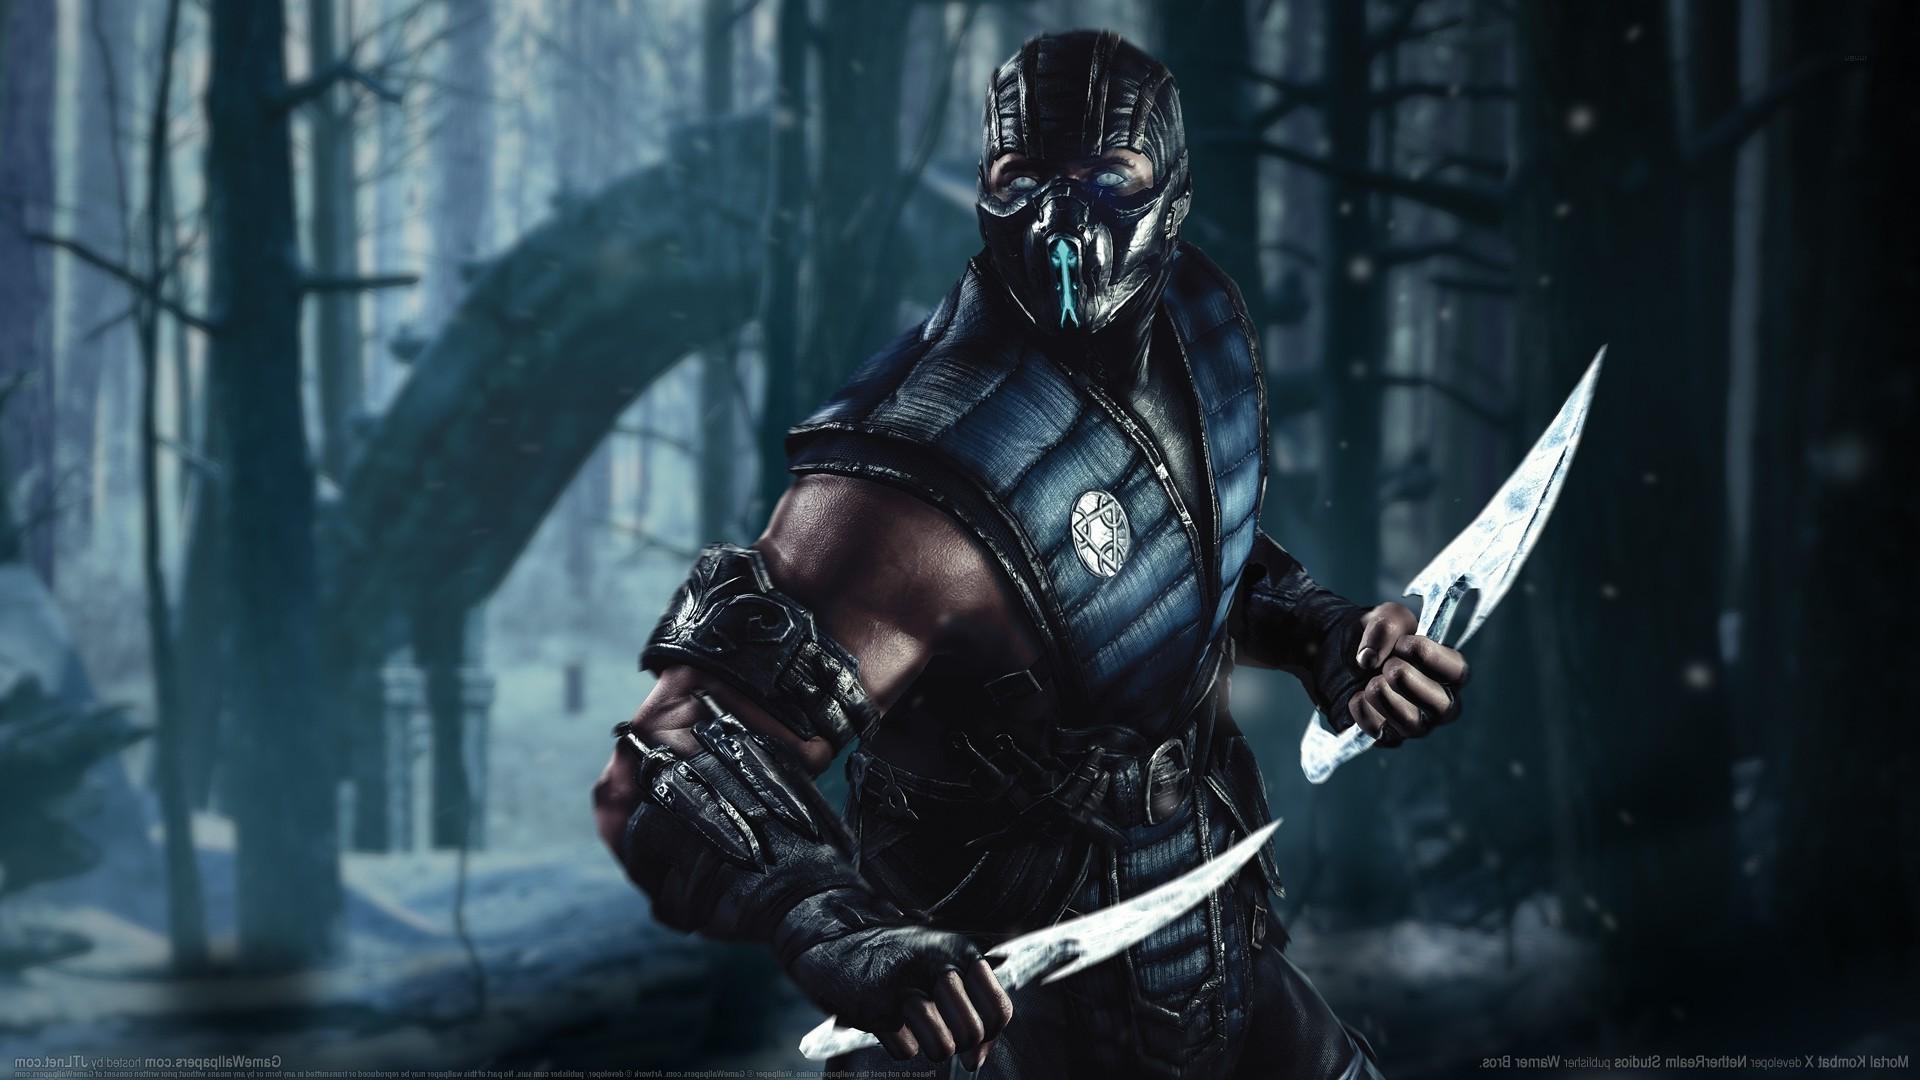 Mortal Kombat X, Mortal Kombat, Sub Zero, Video Games, Sub Zero,. Until Dawn  …